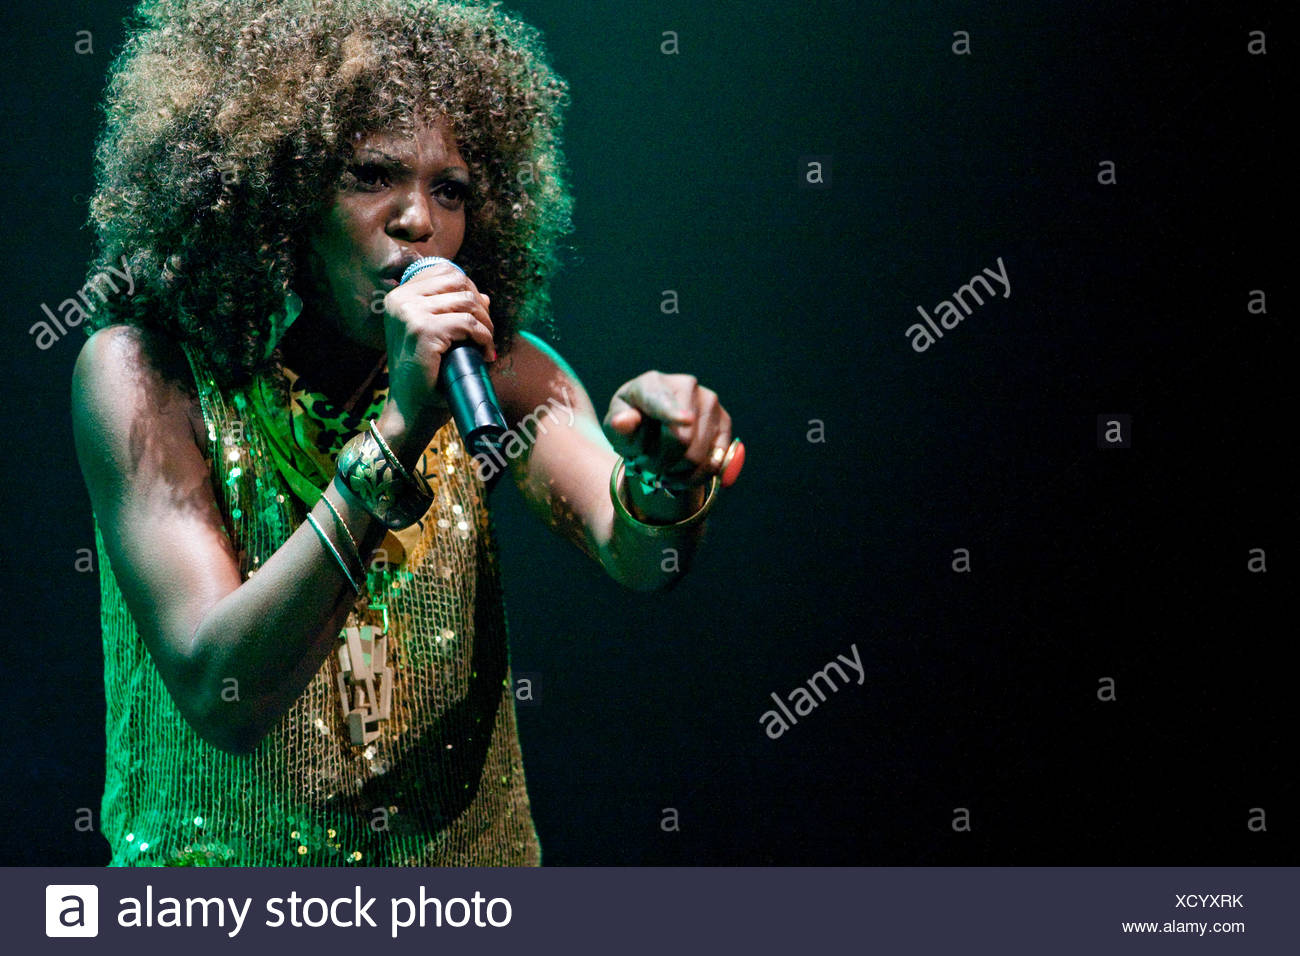 Dancehall Jamaica Stock Photos & Dancehall Jamaica Stock Images - Alamy